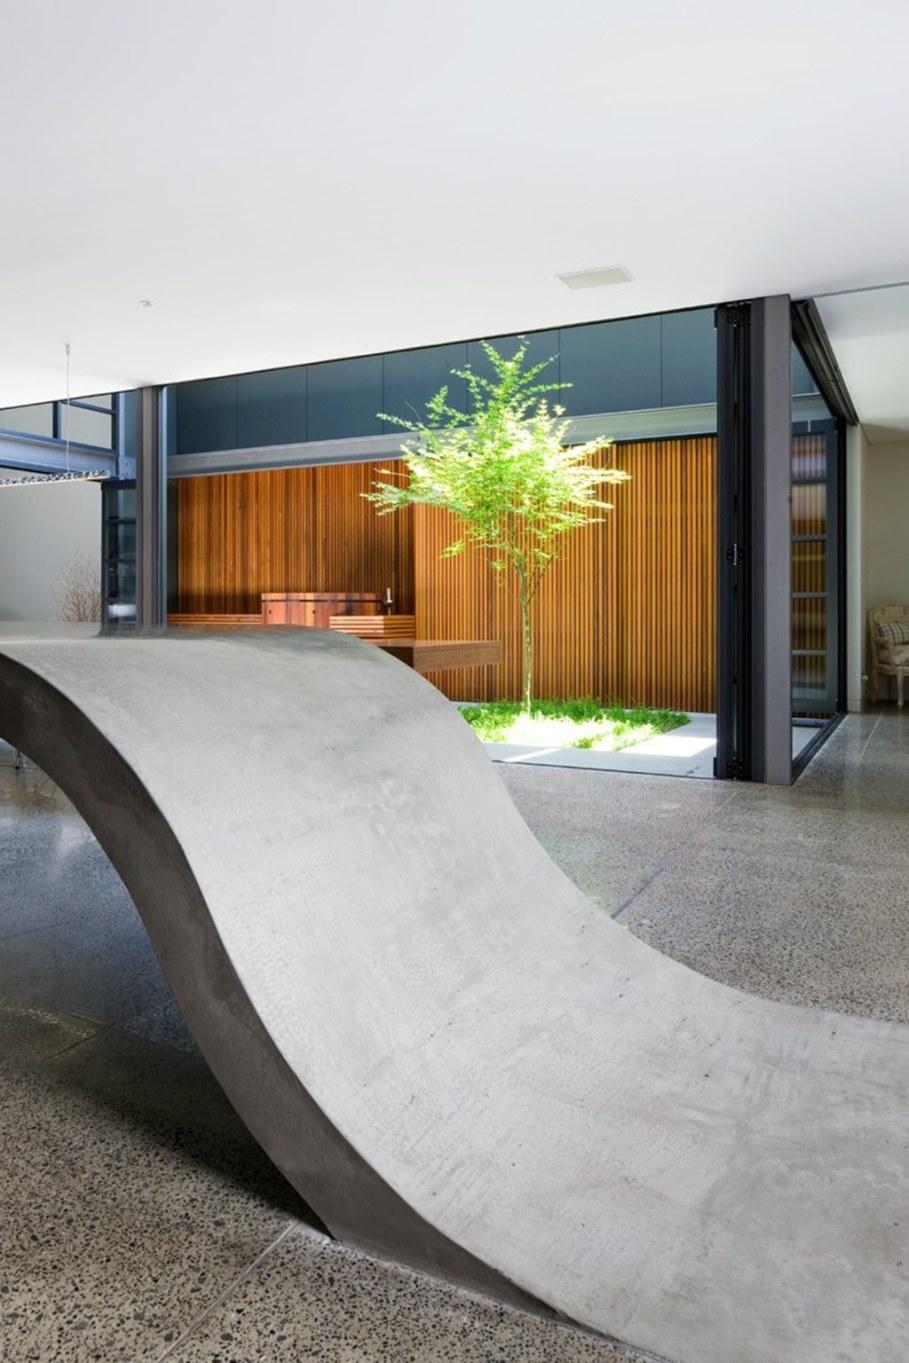 Grand loft house in Australia by Corben Architects studio - Kitchen 5